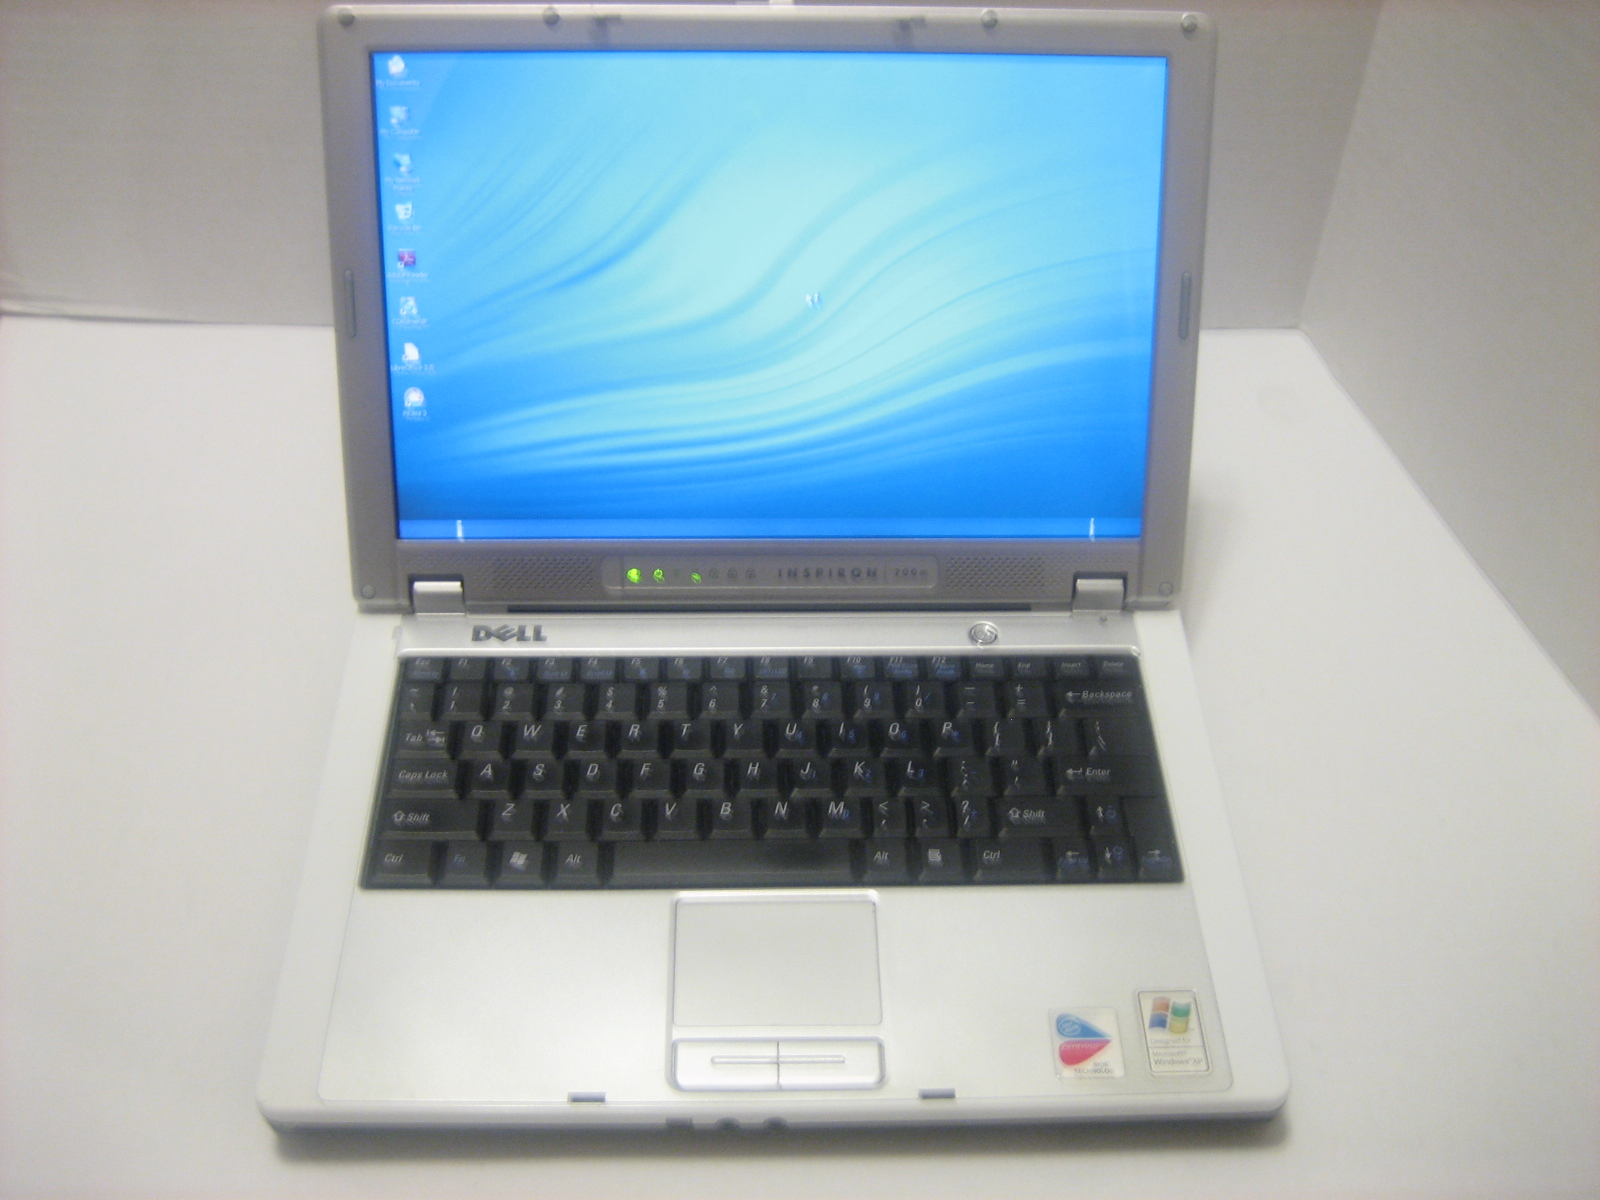 Dell Inspiron 700m 121 Laptop Indy Tech Expert